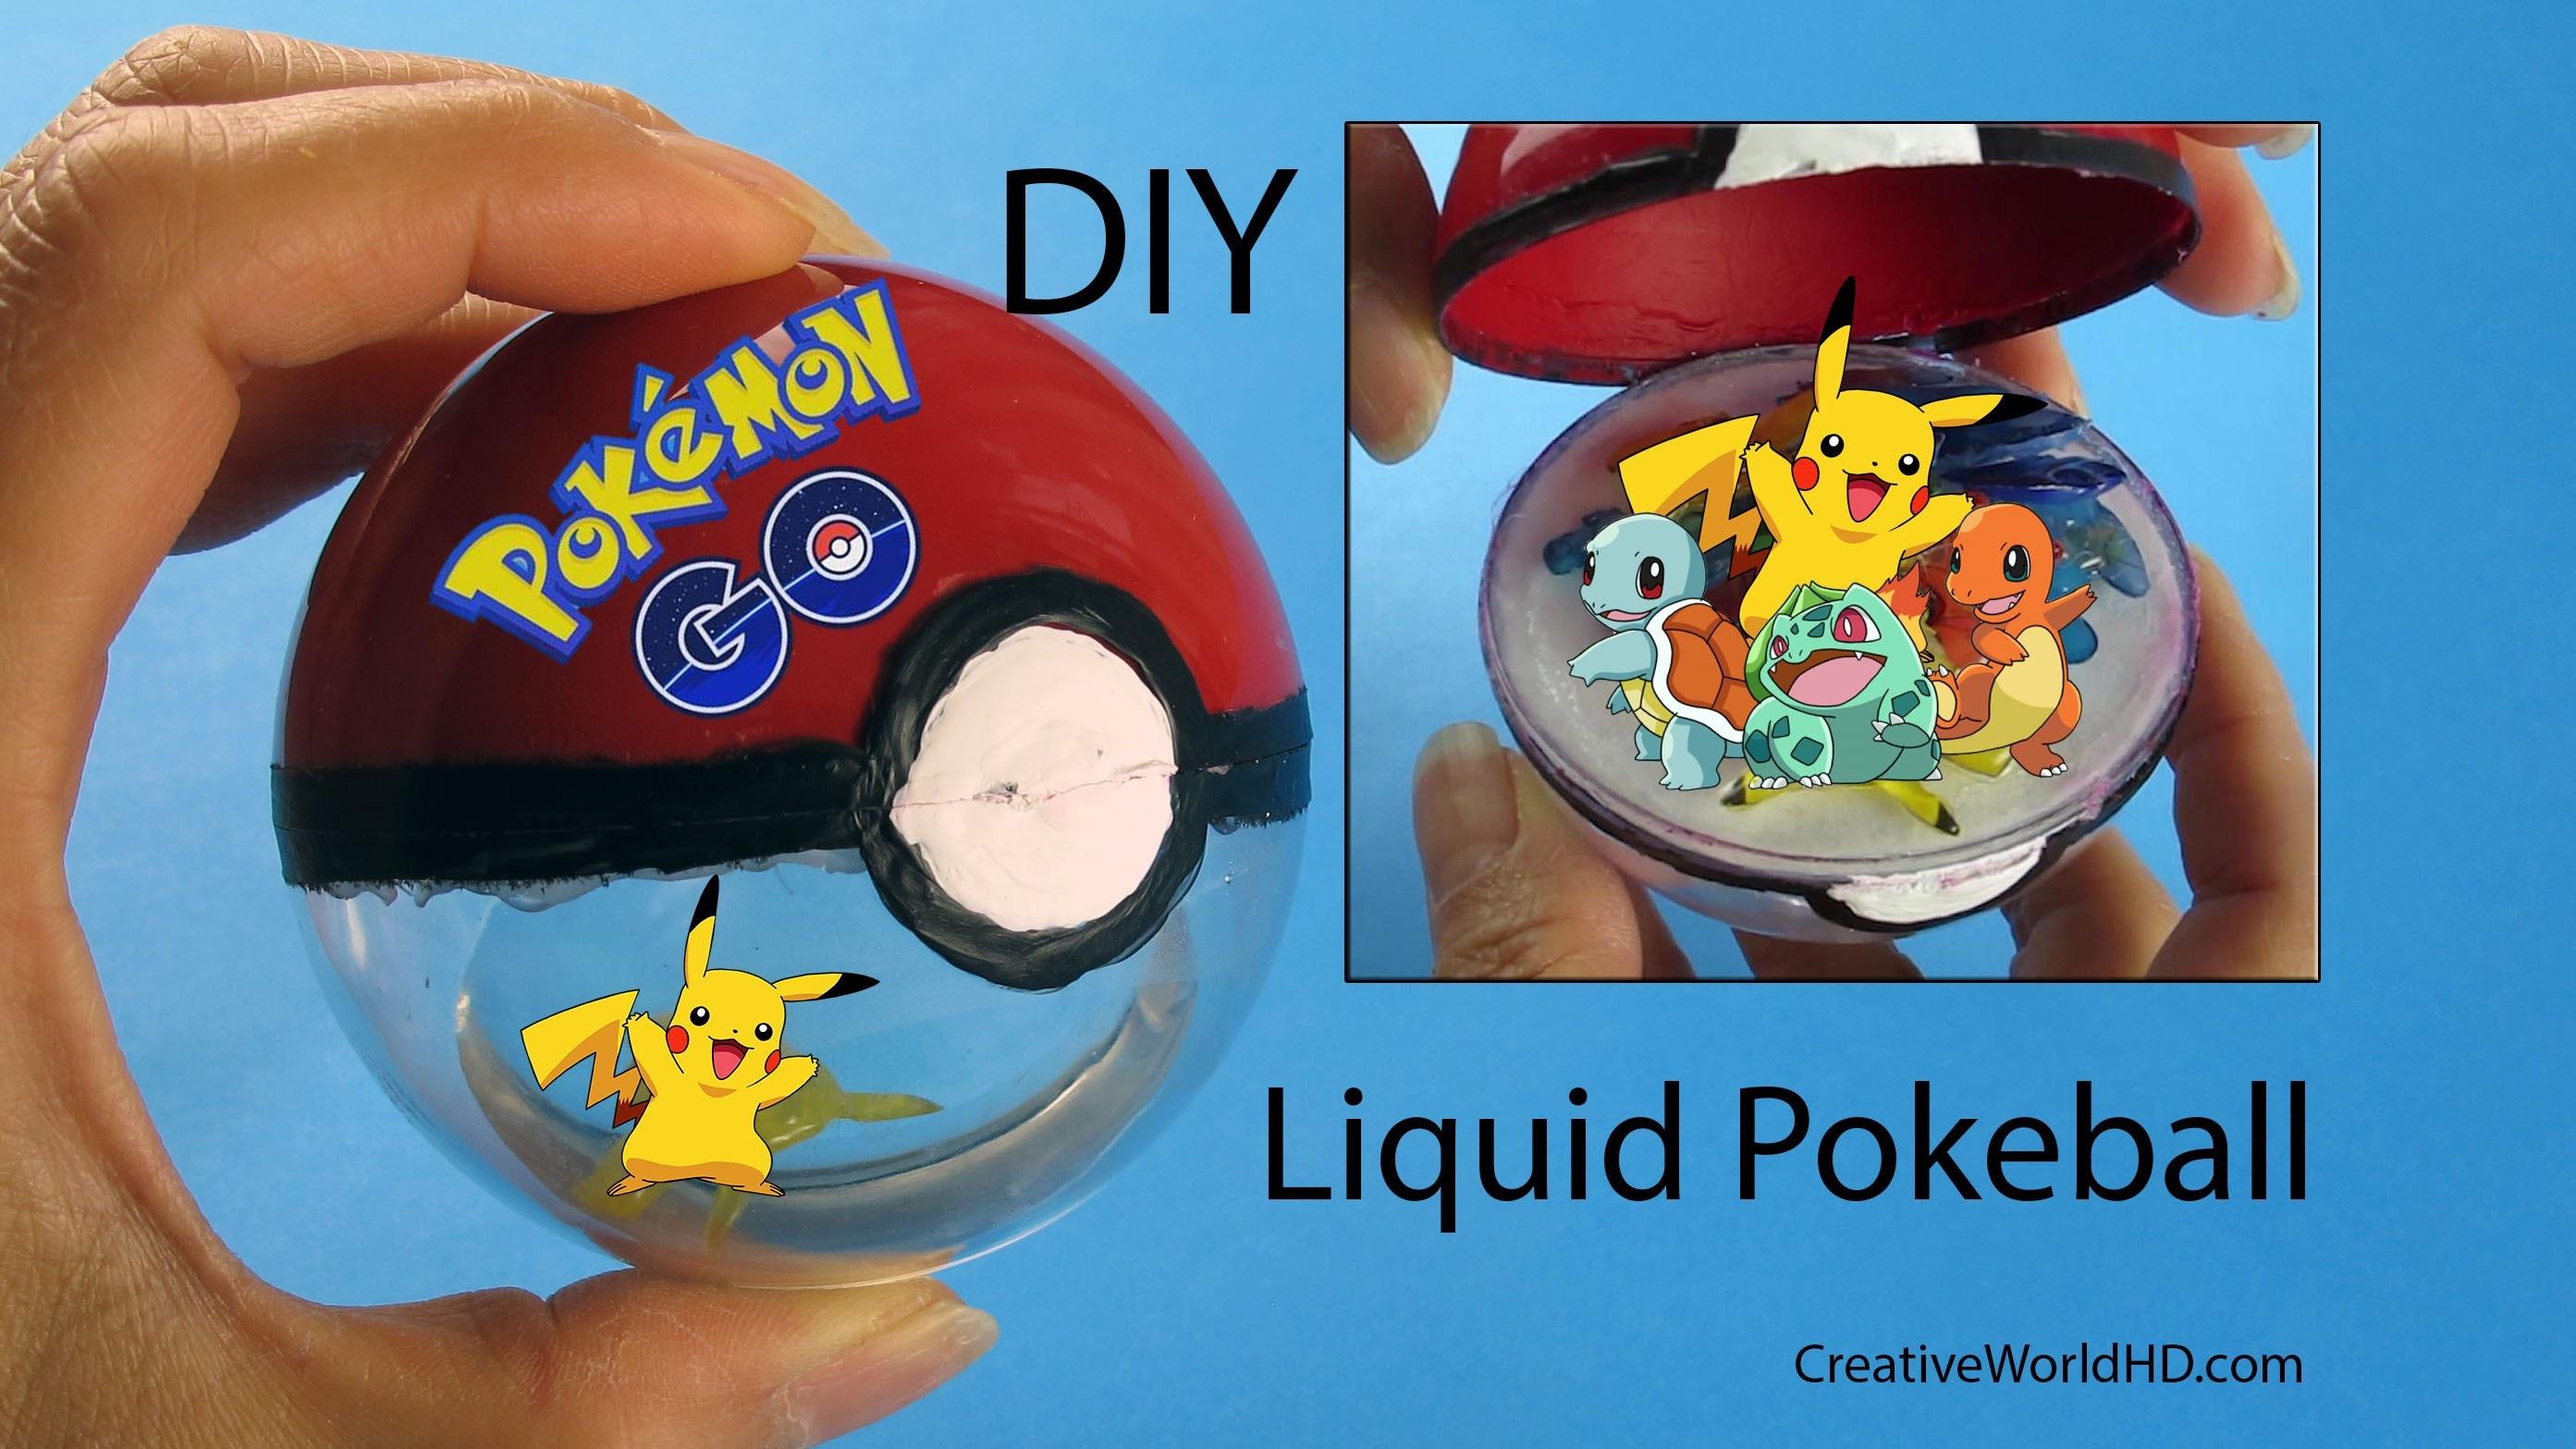 DIY: Liquid Pokeball Openable with Pokemon Inside Pokemon Go.How to Tutorial by Creative World